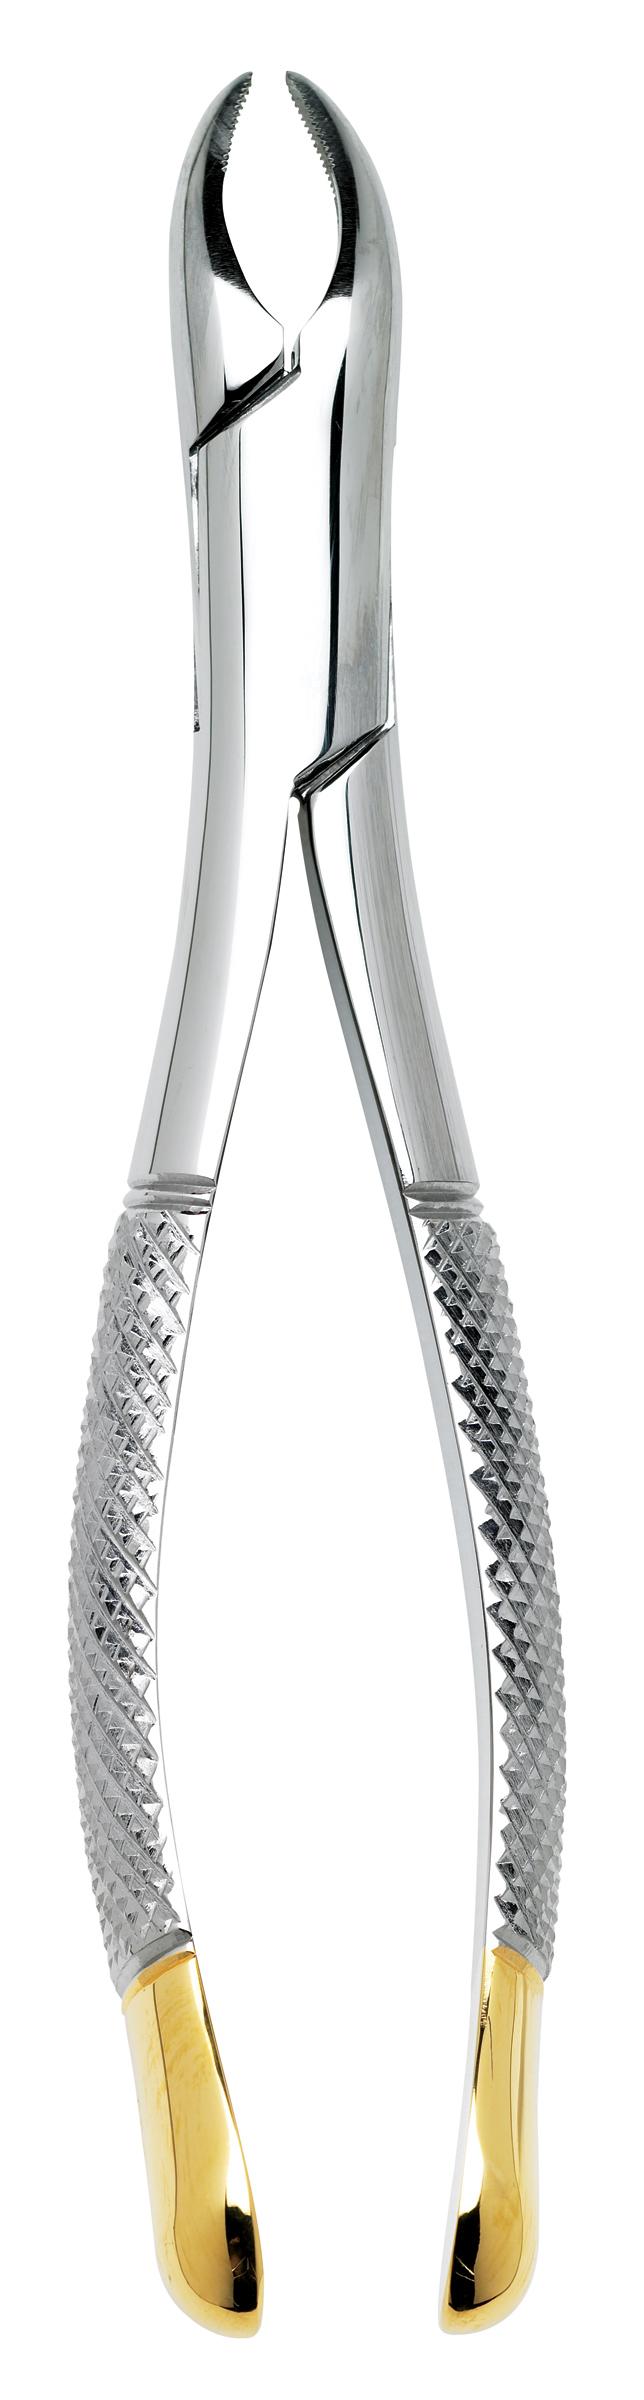 150tc-extracting-forceps-serrated-carbide-beaks-def150tc-miltex.jpg